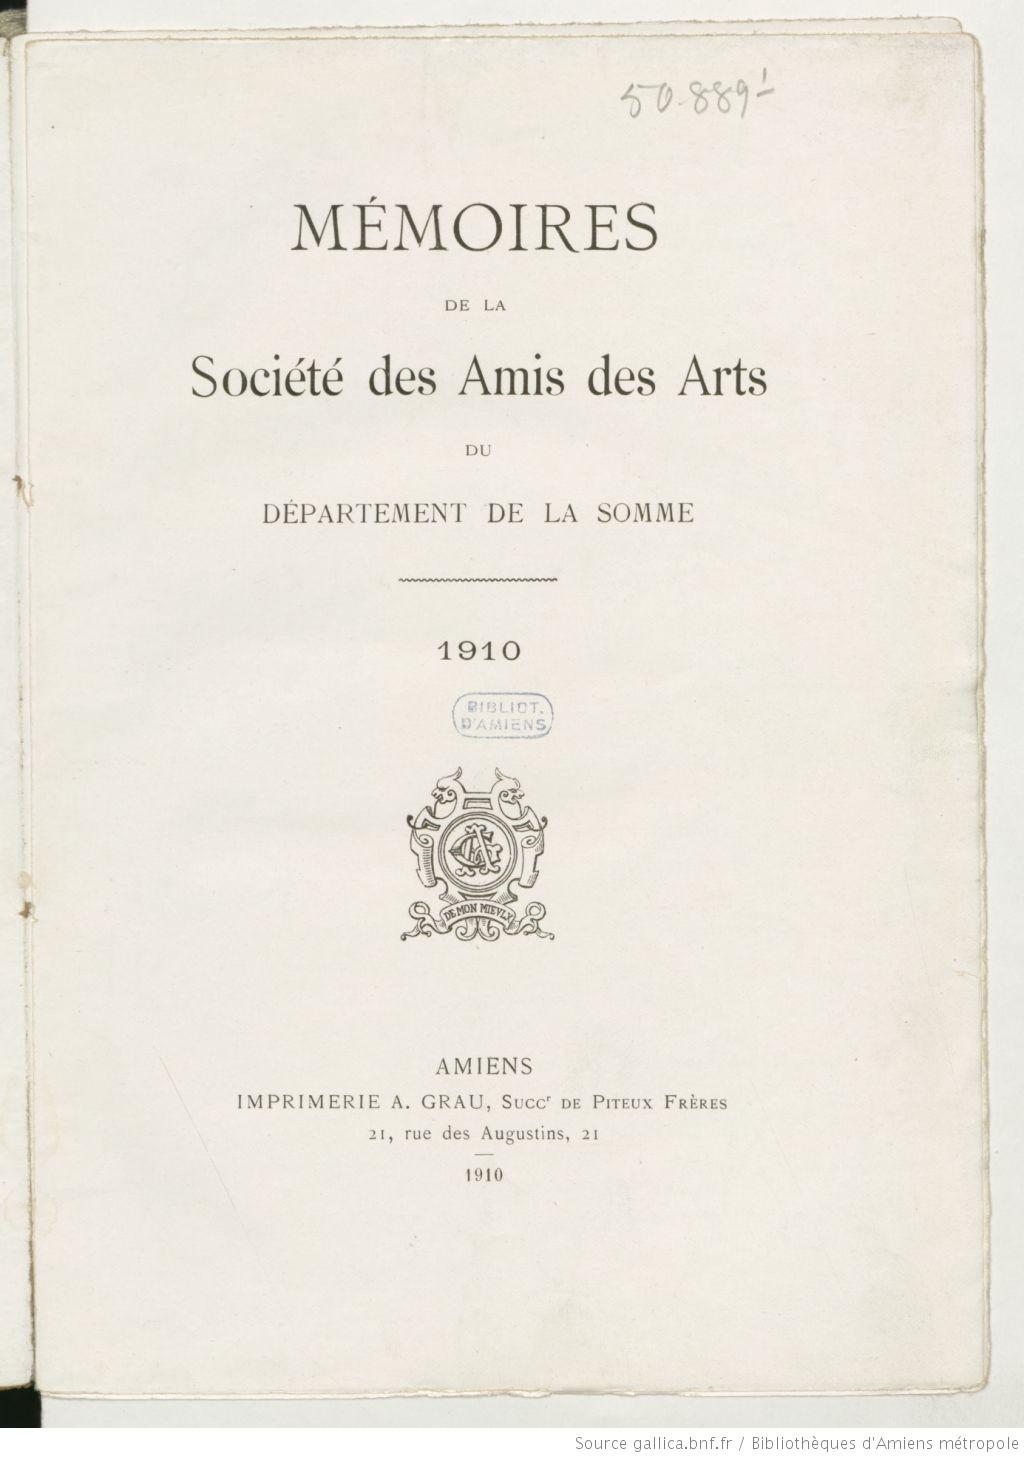 https://gallica.bnf.fr/ark:/12148/bpt6k9607033t.highres.jpg